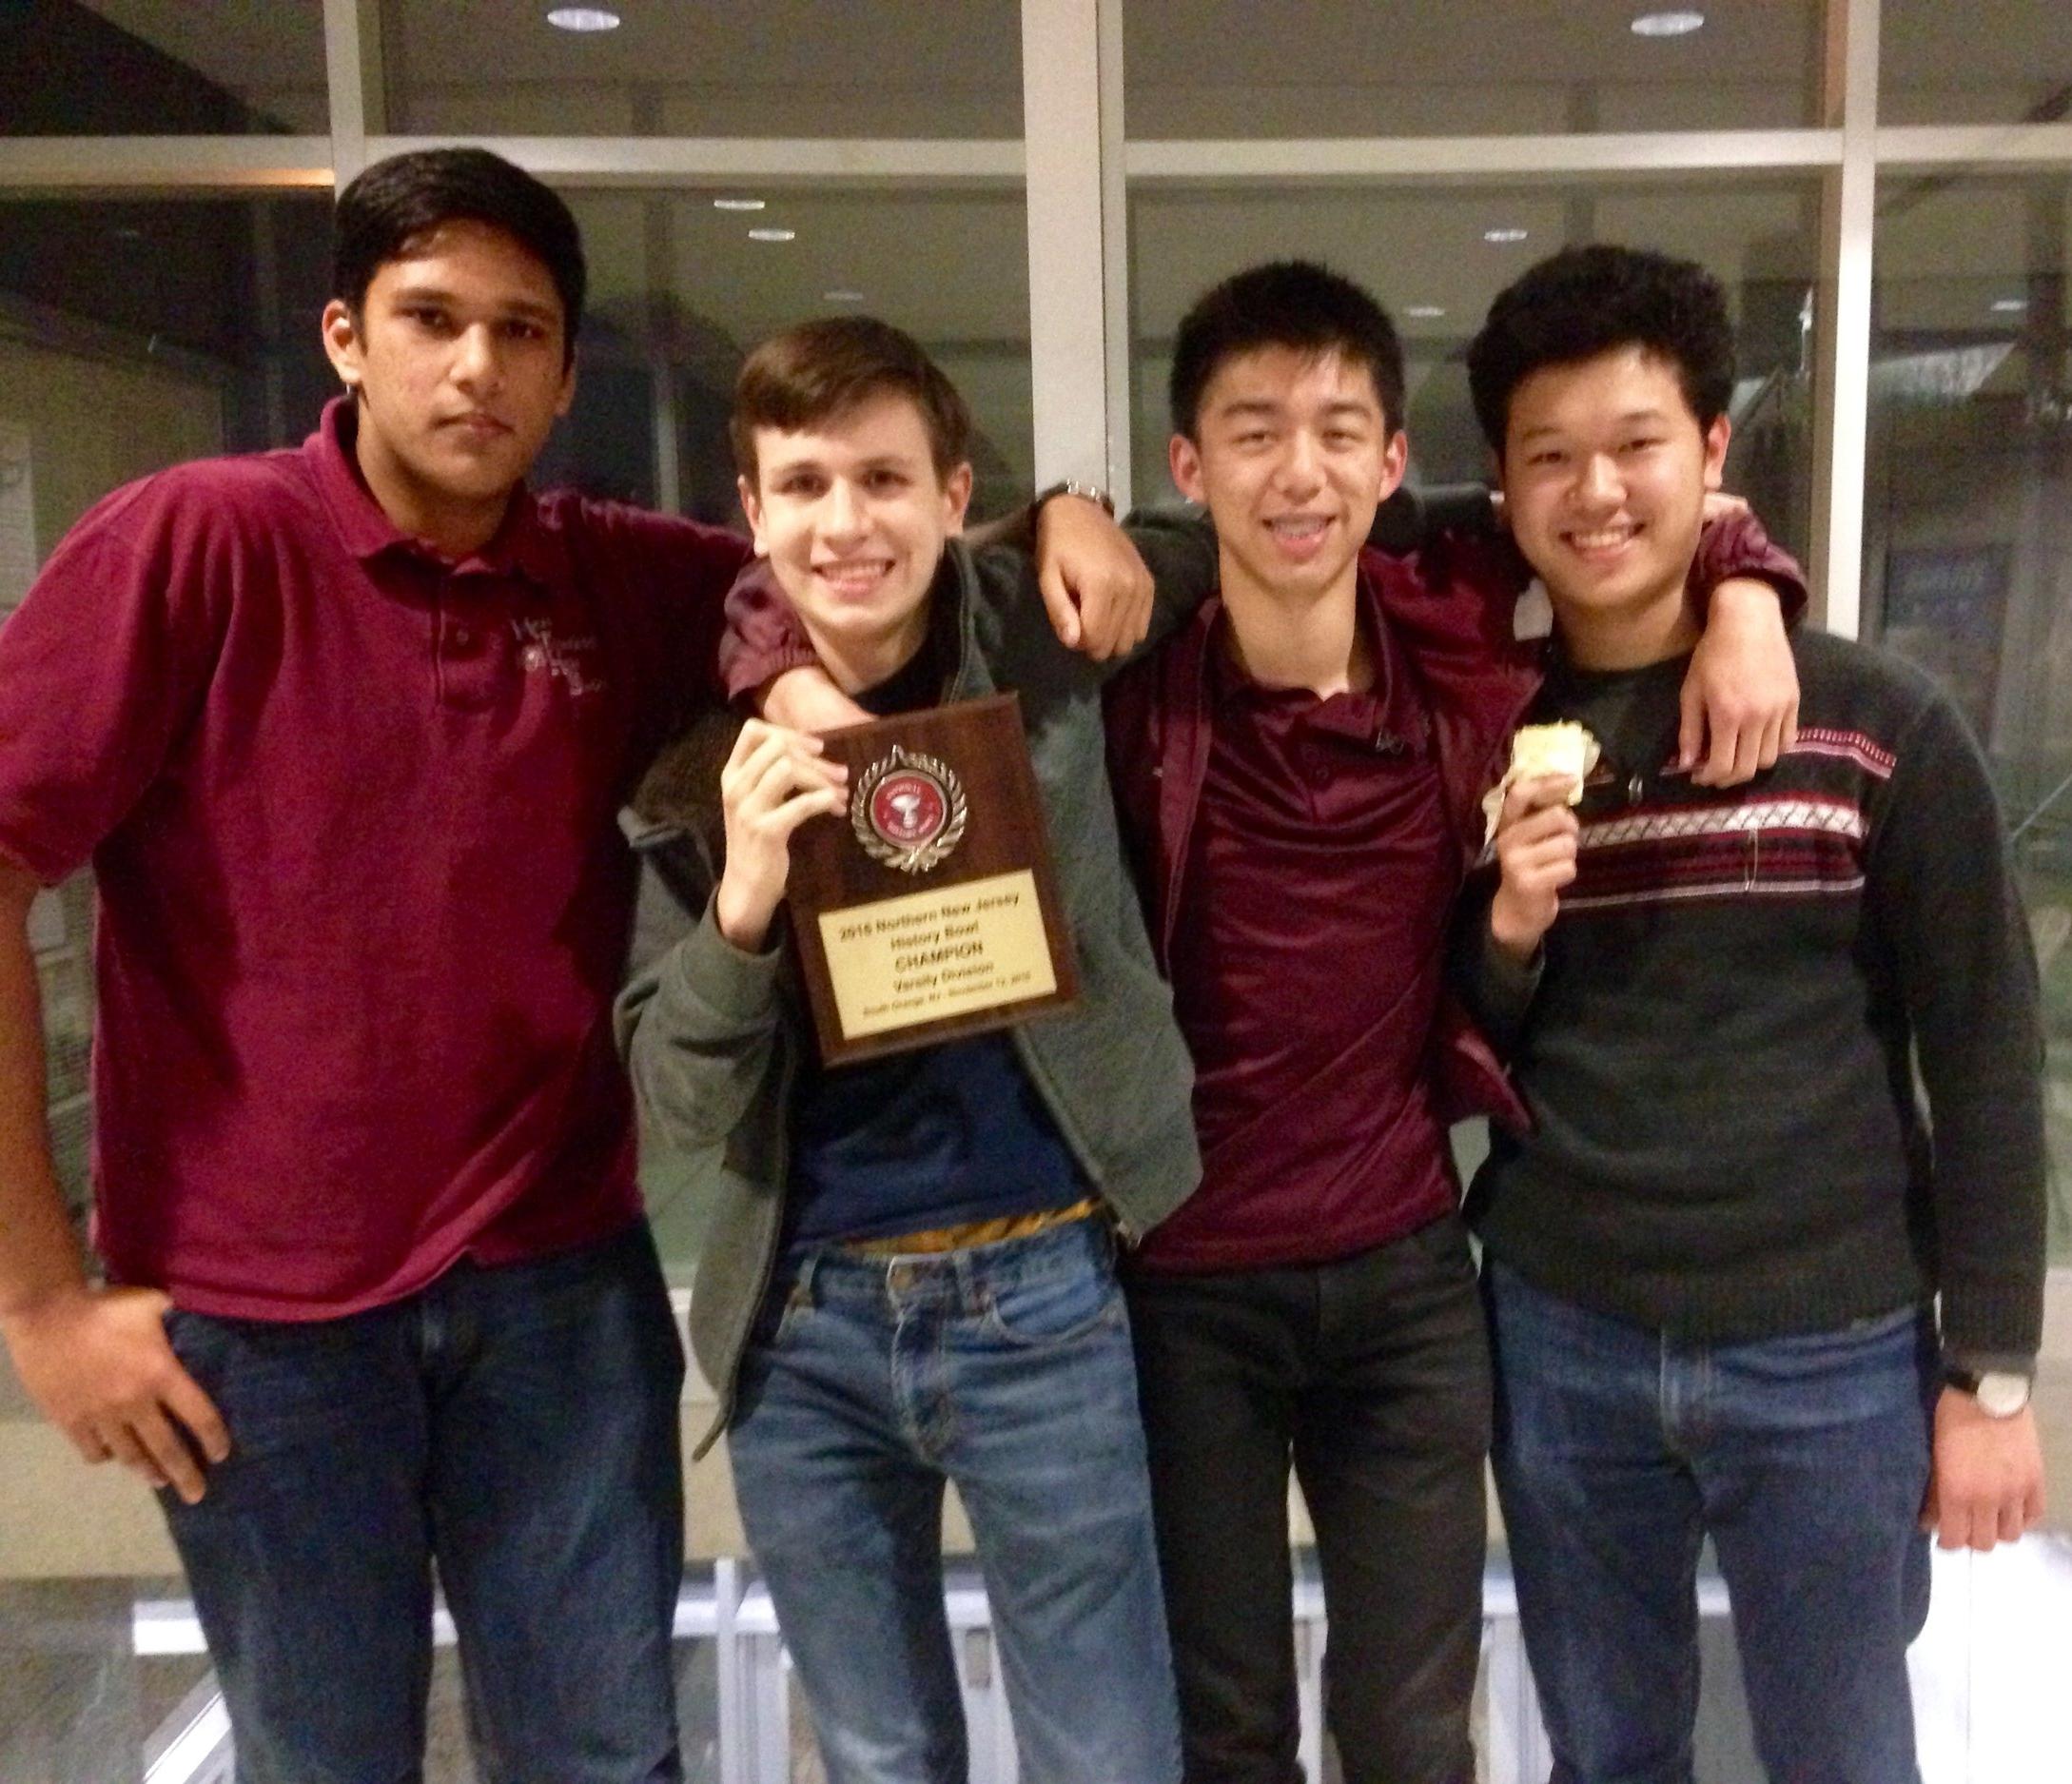 Gaurav Sharma, Douglas Simons, Kevin Lu, and Samuel Kao celebrate their victory.